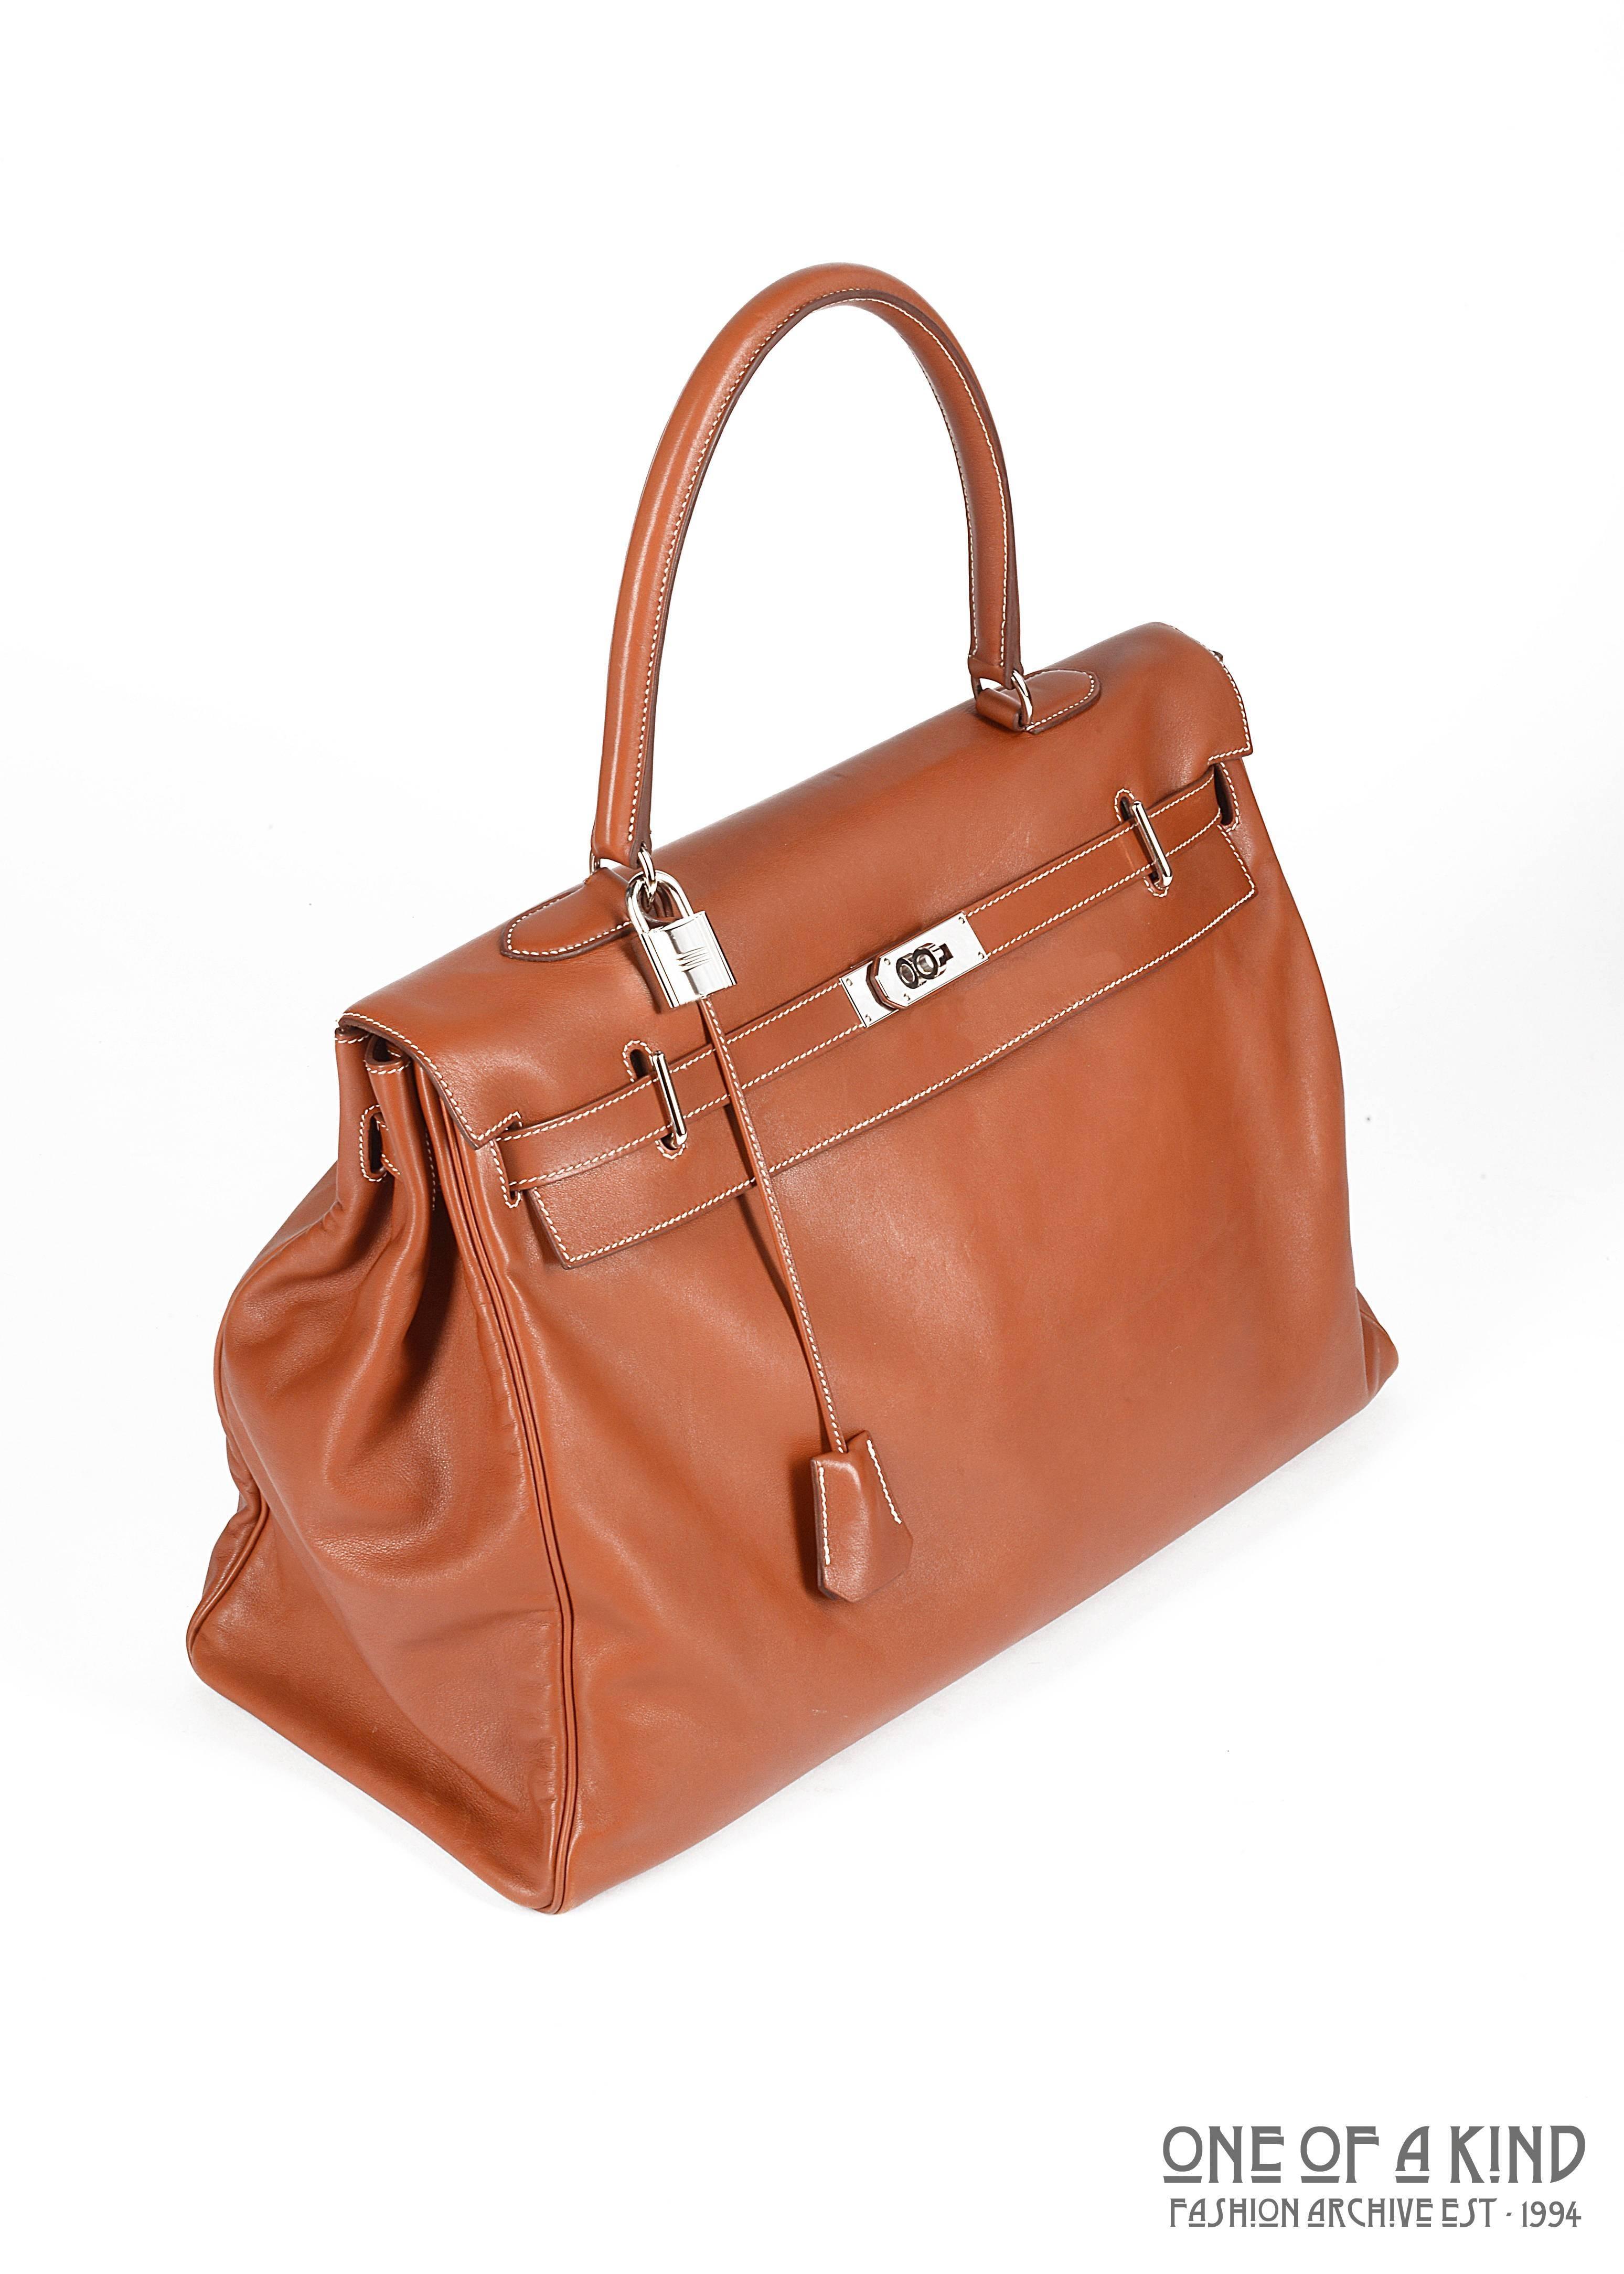 78b5def73de ... france hermes paris xxl tan leather travel kelly bag with silver  hardware tourterelle veau sikkim leather